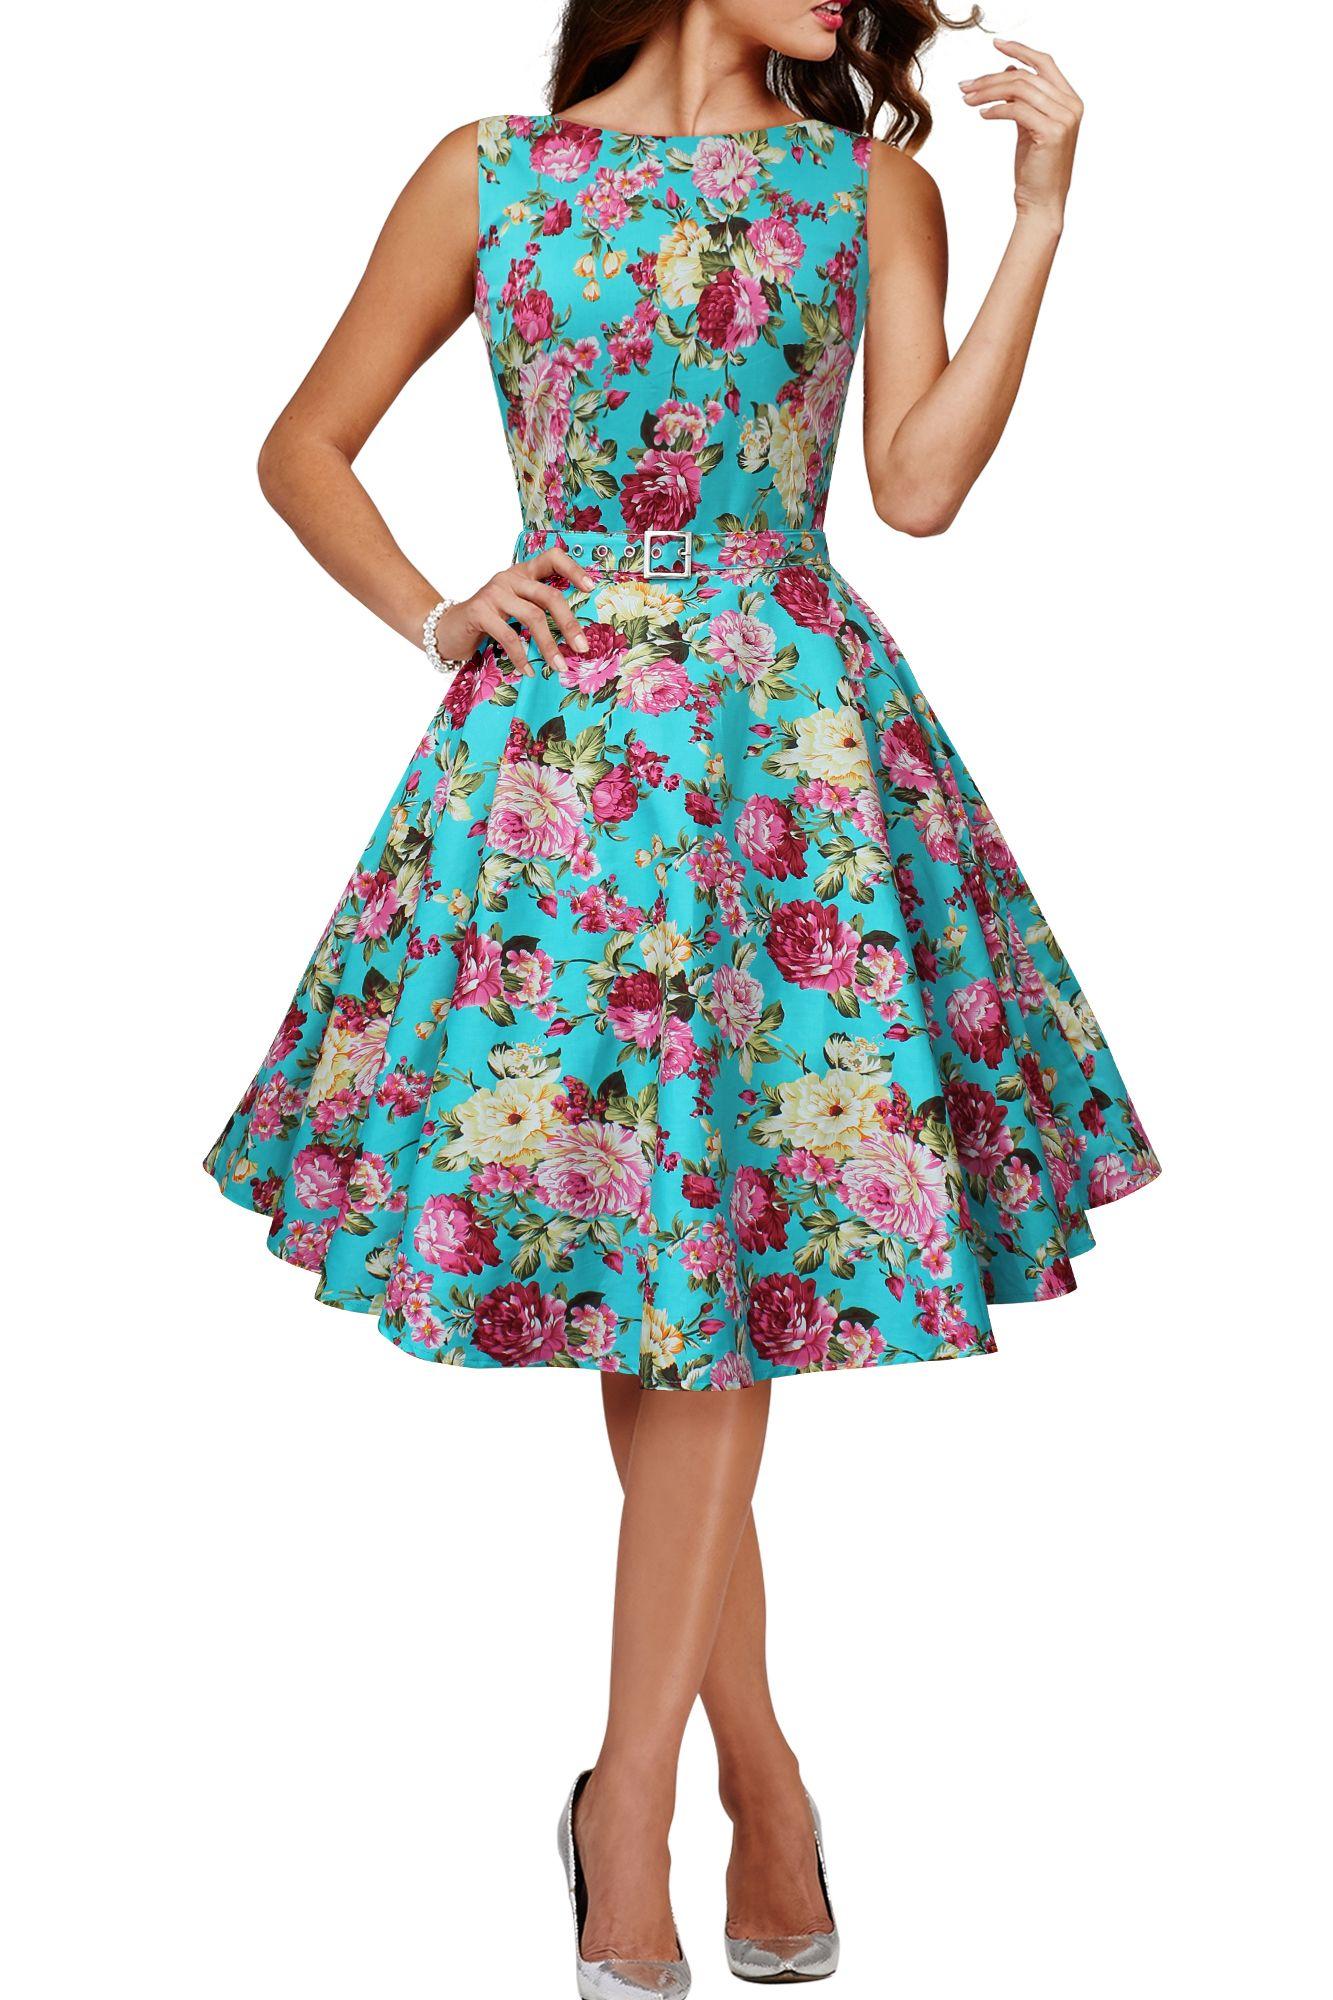 Audrey Hepburn Style Floral Vintage Divinity 1950s Rockabilly Swing ...